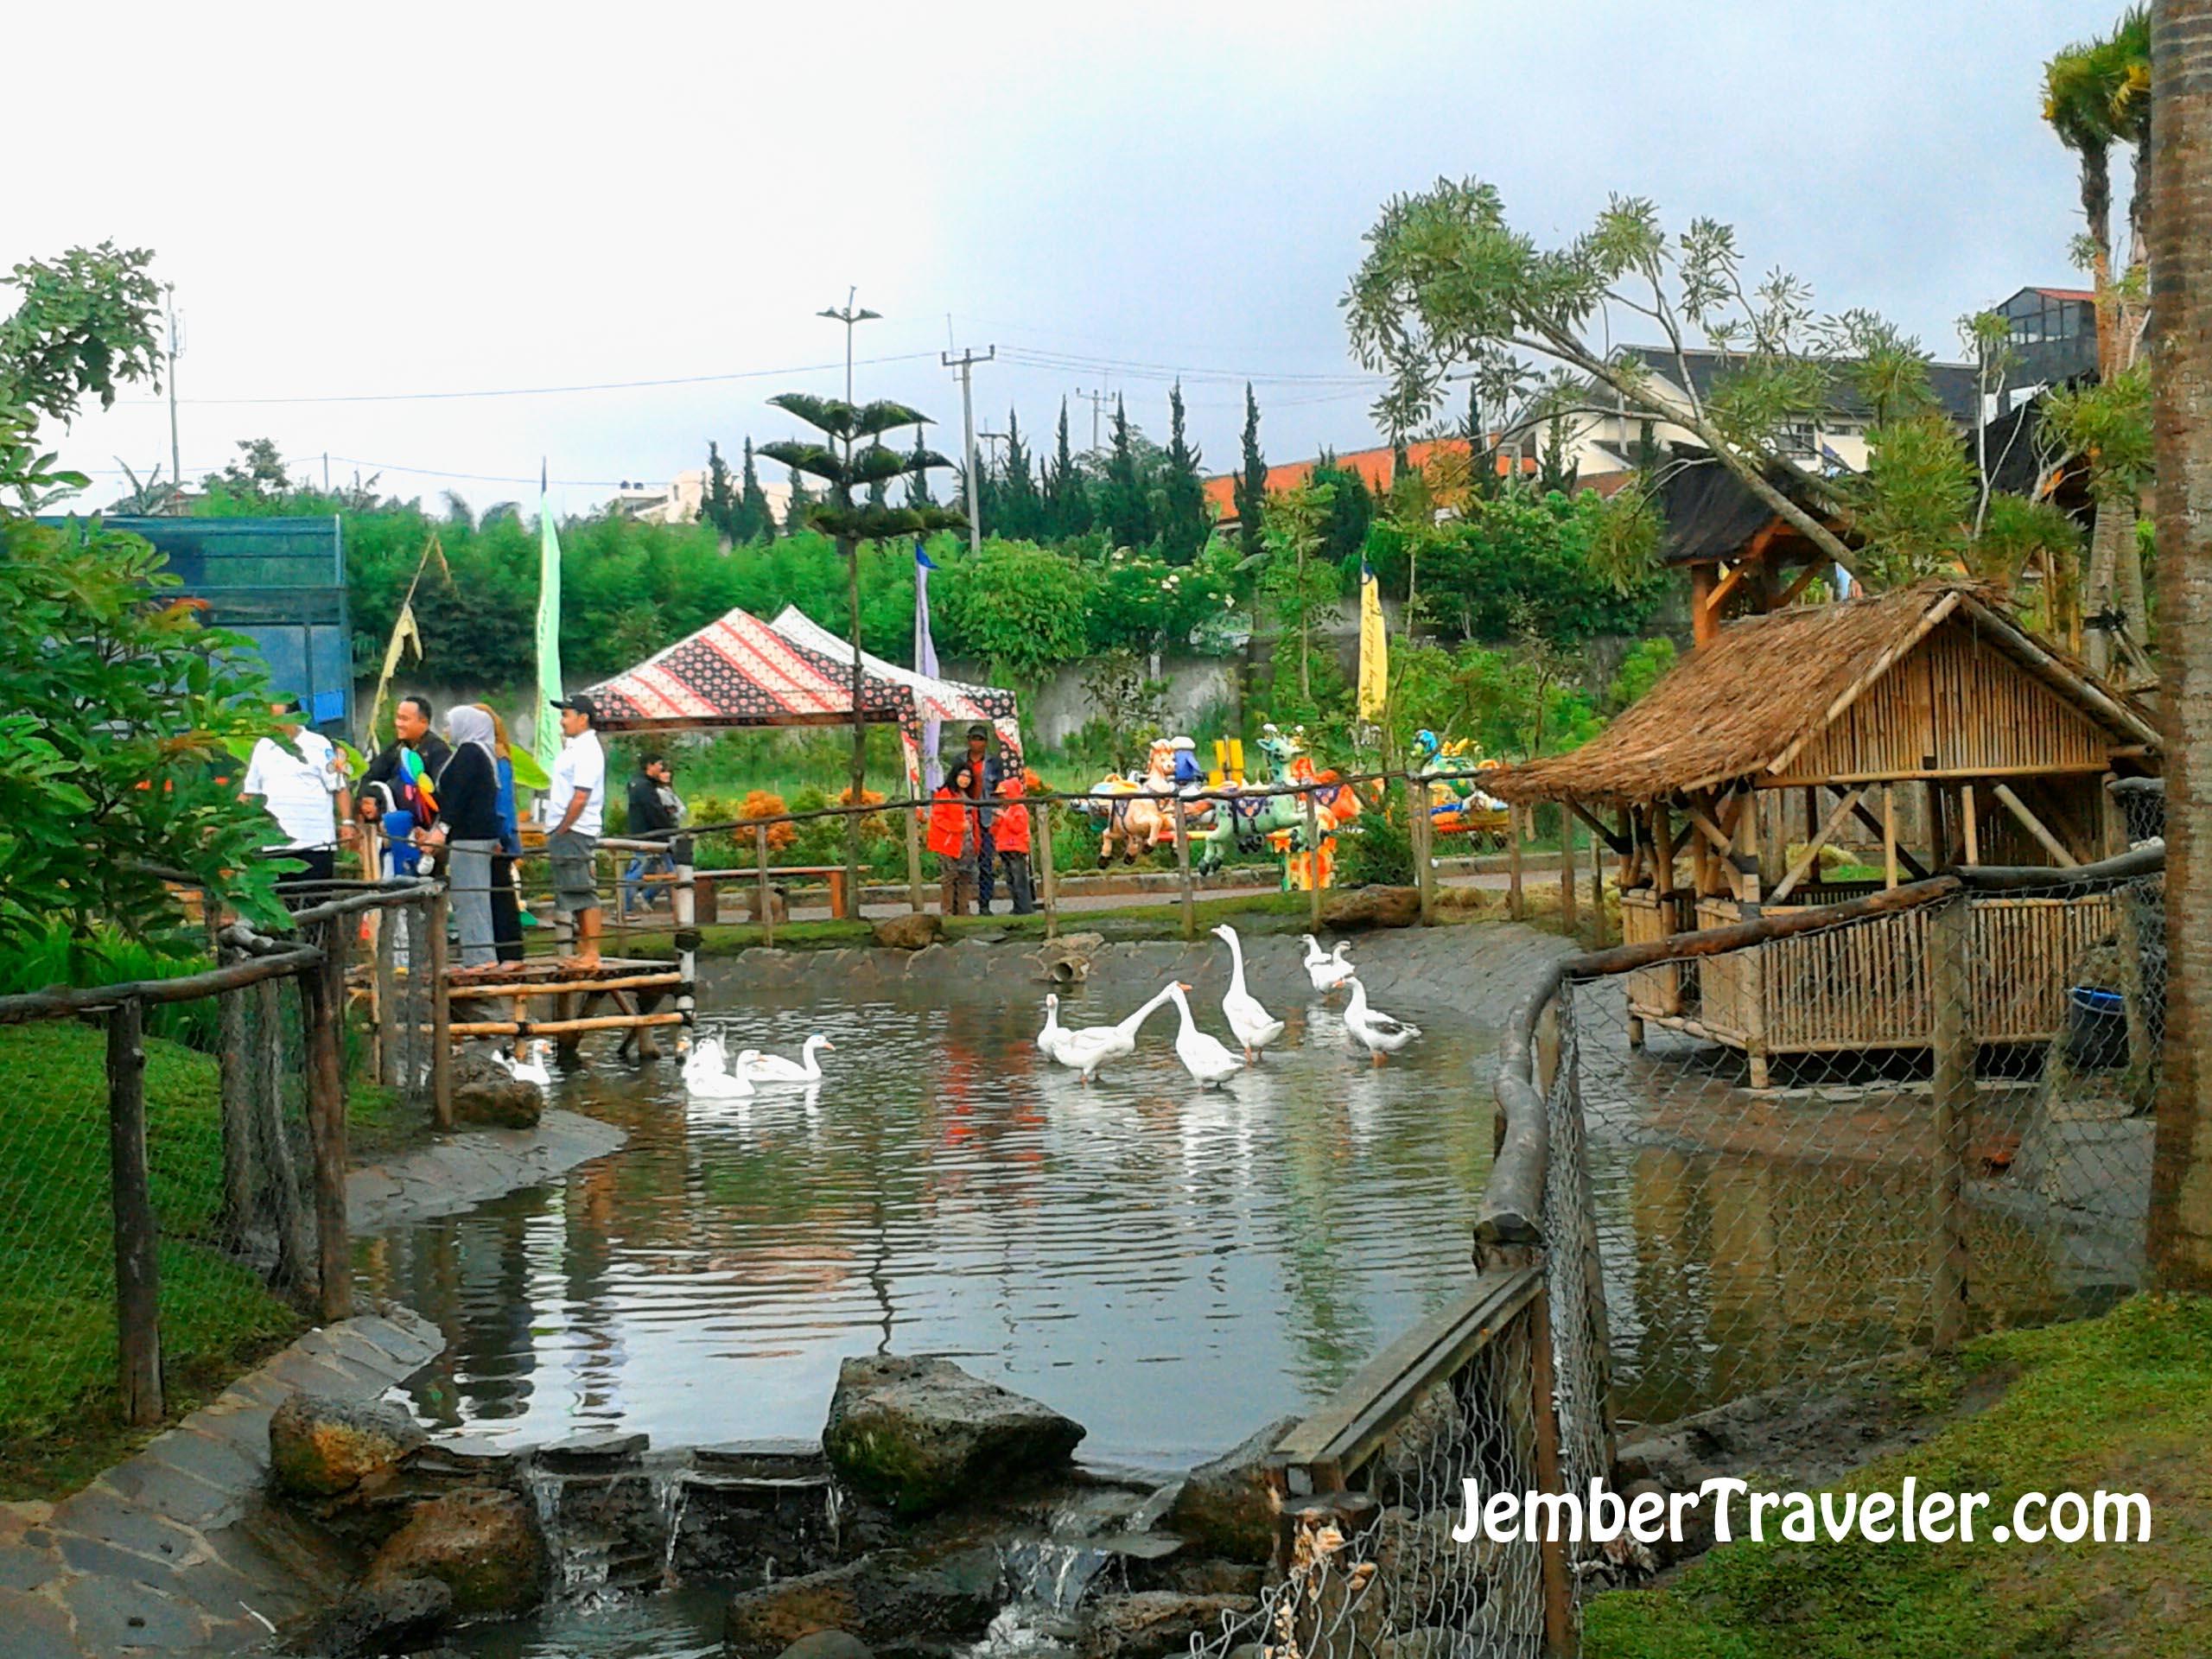 Floating Market Lembang Logo Tiket Masuk Berteduh Di Pasar Terapung Bandung Jember Traveler